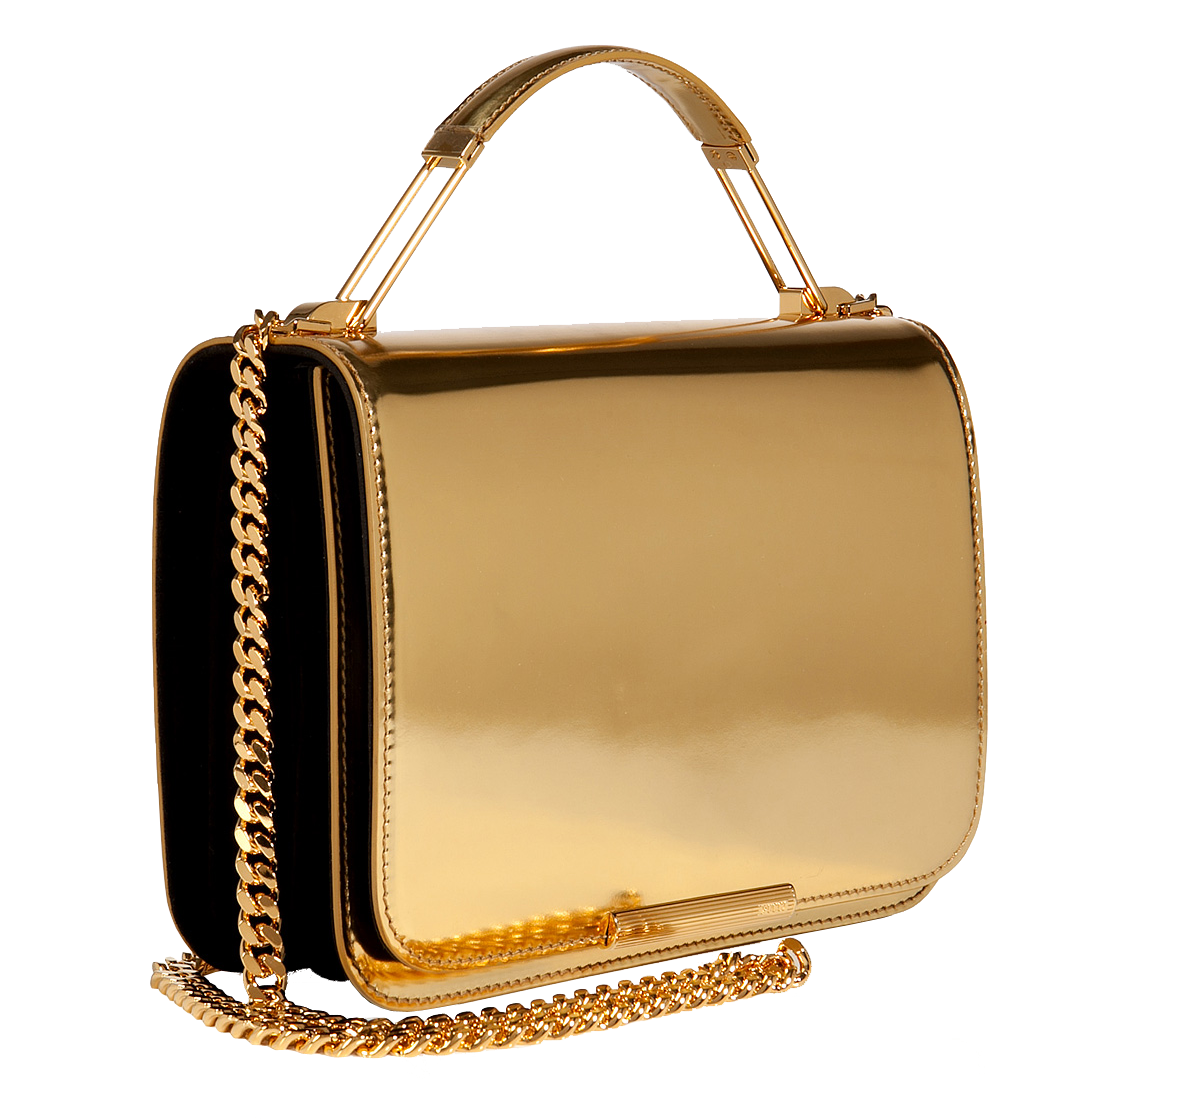 Emilio Pucci Leather Accordion Satchel in Gold Metallic